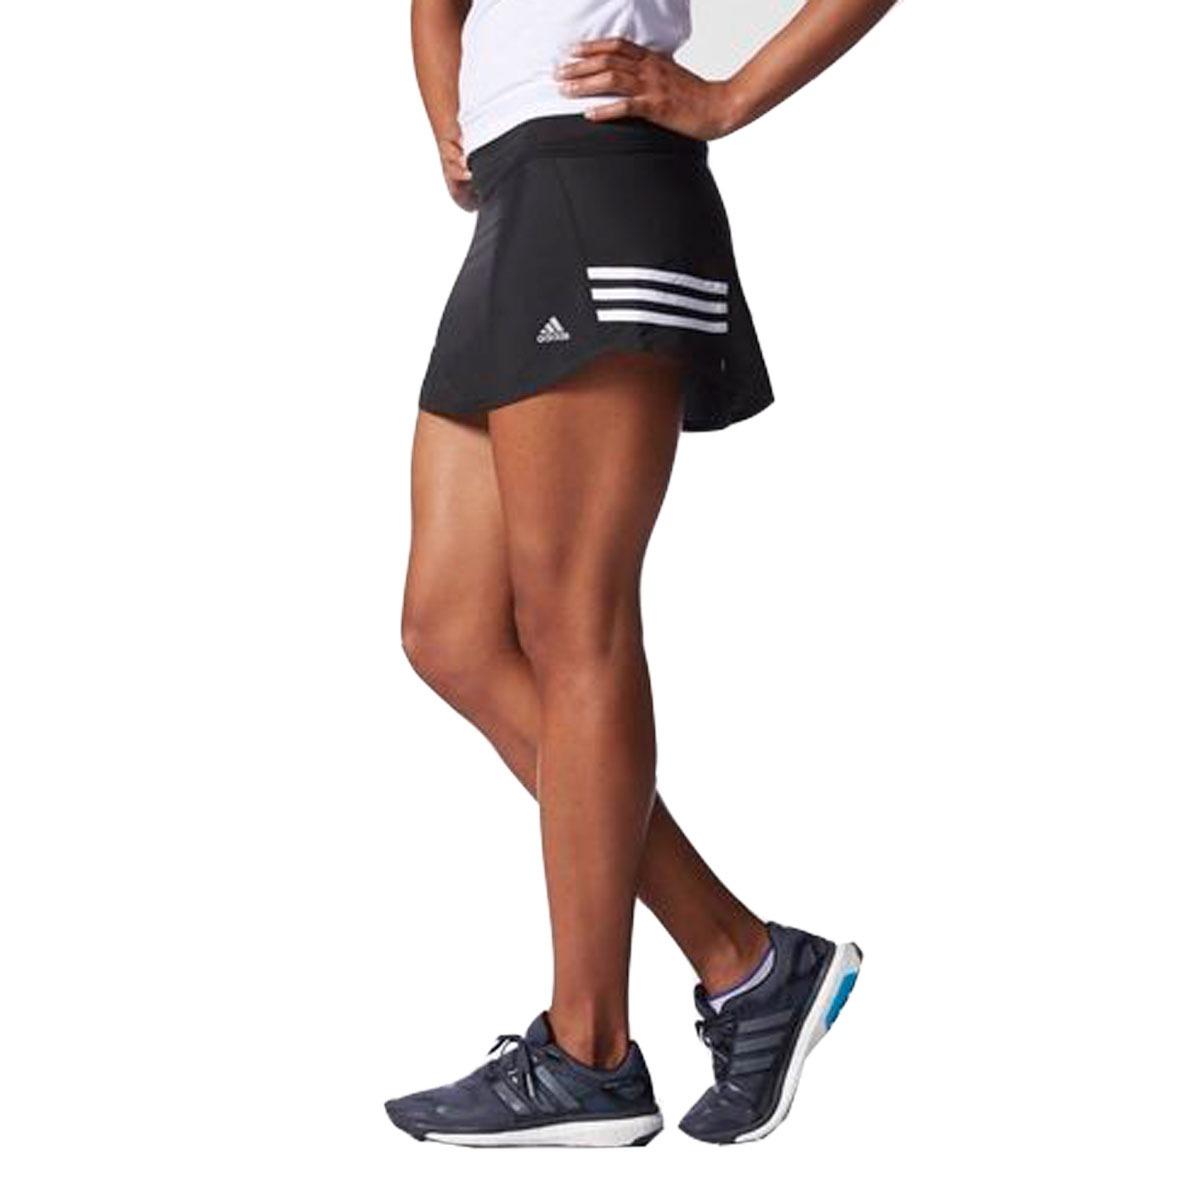 Saia Shorts Fitness adidas Feminino Preto Original Esportivo - R ... 273c6ea68ed8f